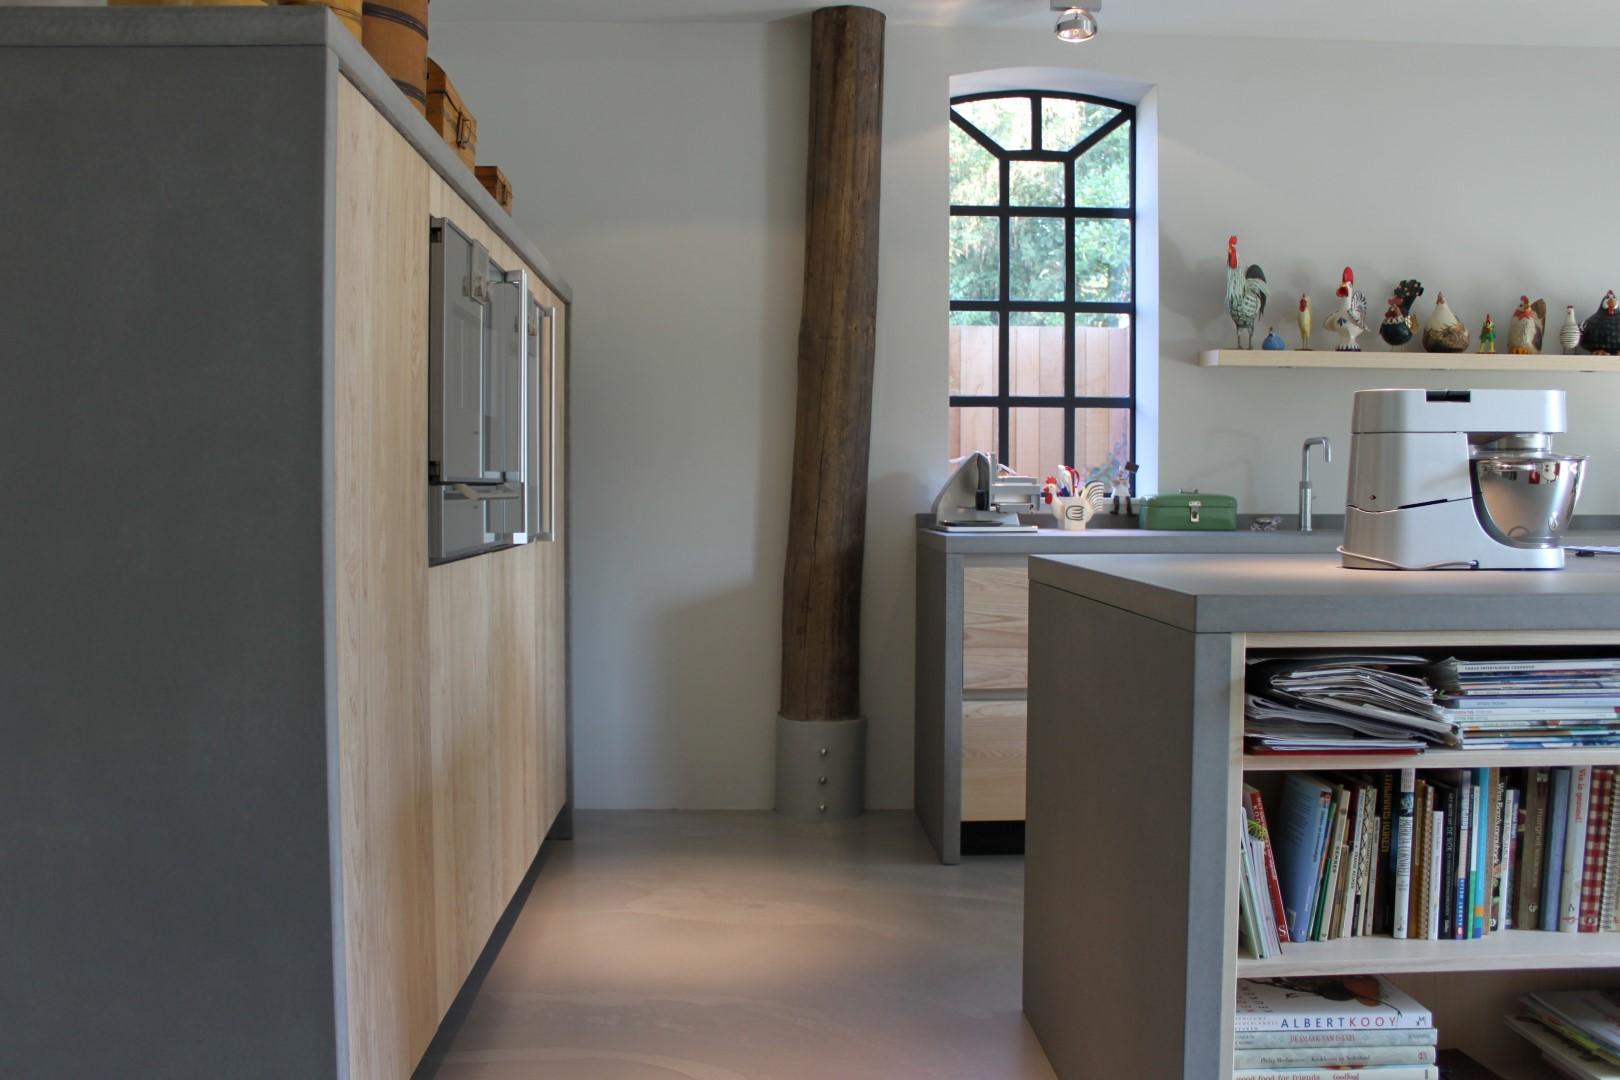 High end kitchen: Modern essenhouten keuken met beton ...